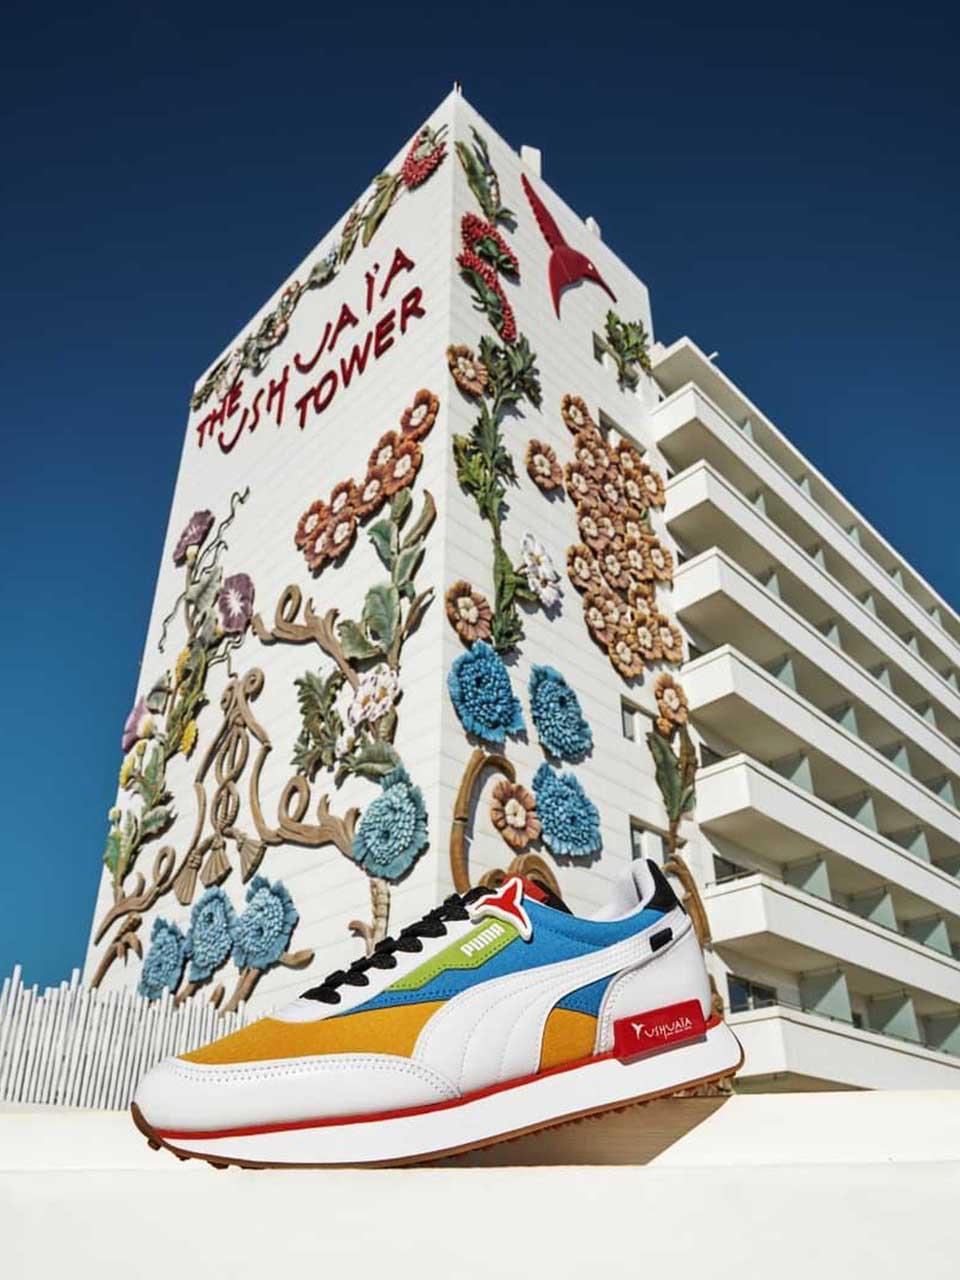 Ushuaïa Ibiza-Kollektion von PUMA